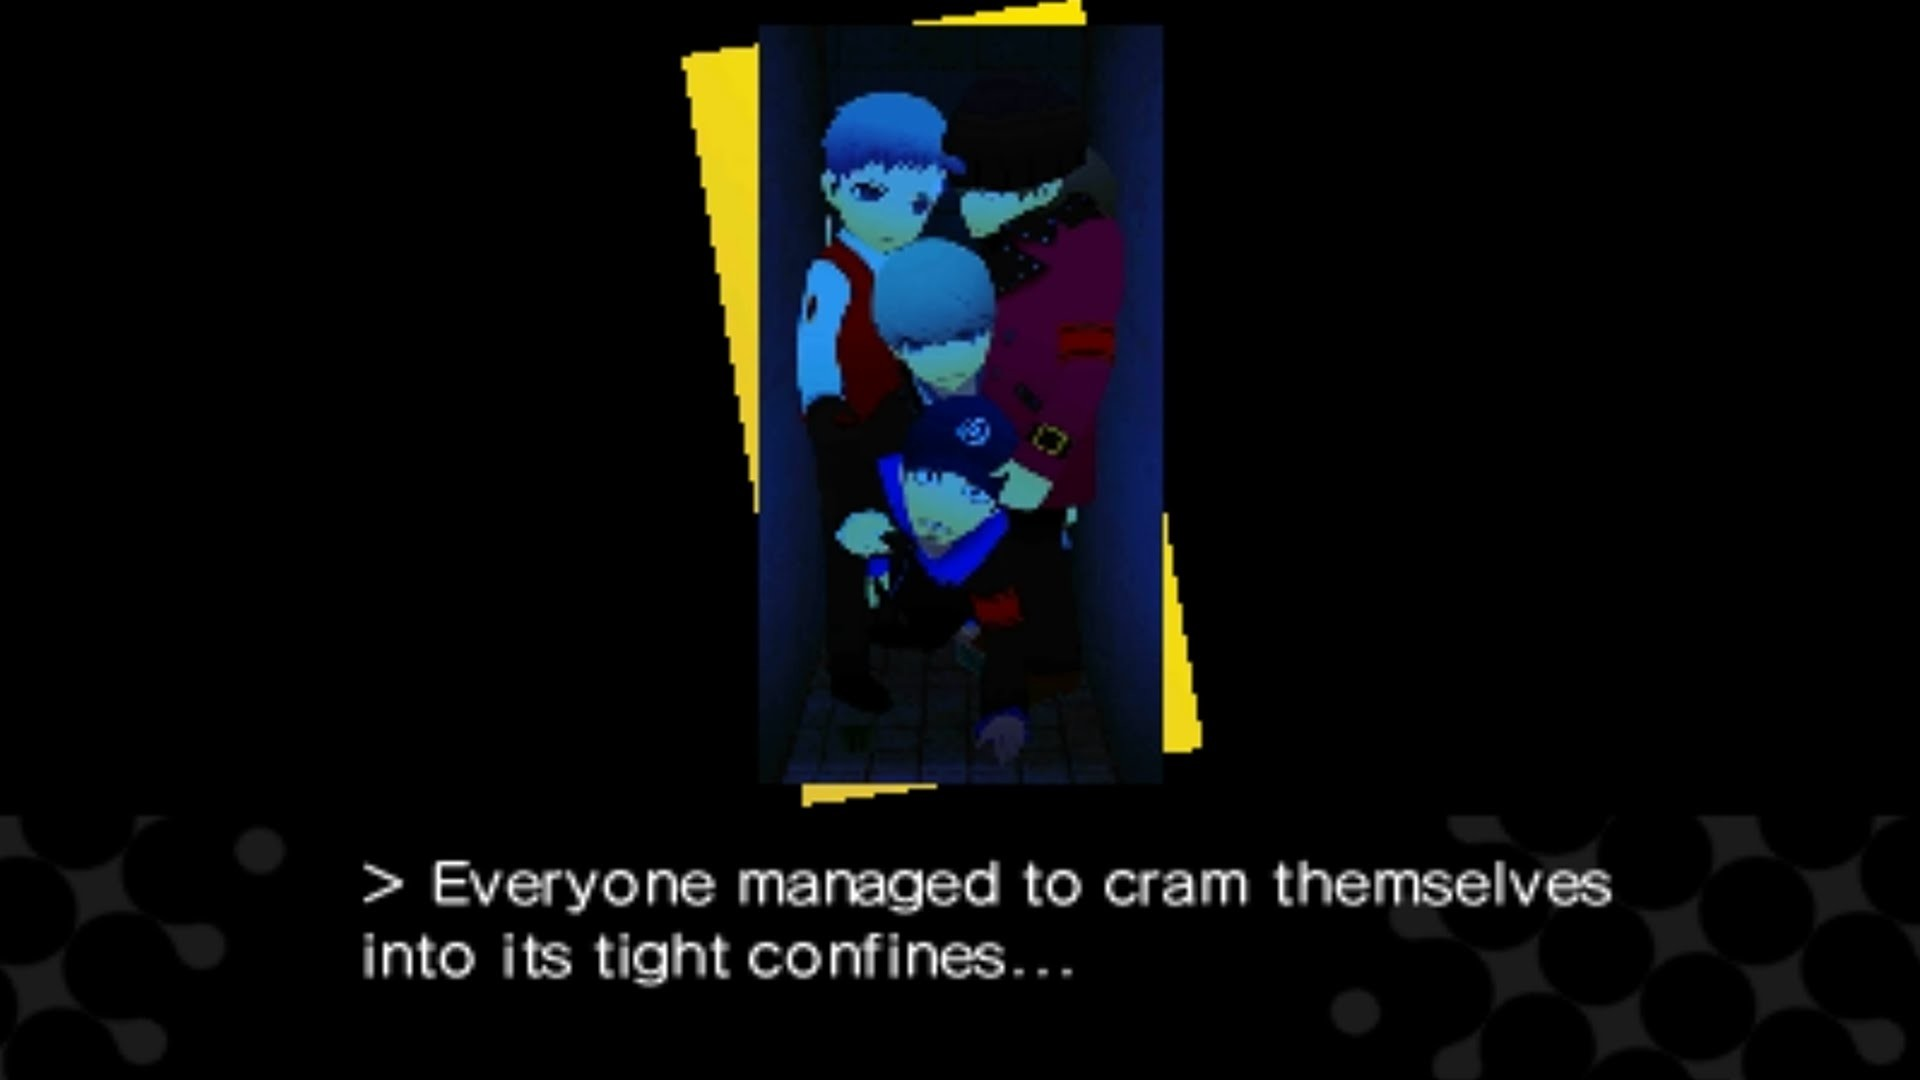 [3DS] Persona Q: Shadow of the Labyrinth [Persona 4] – Bathroom Scene  (Choosing Junpei's Closet)